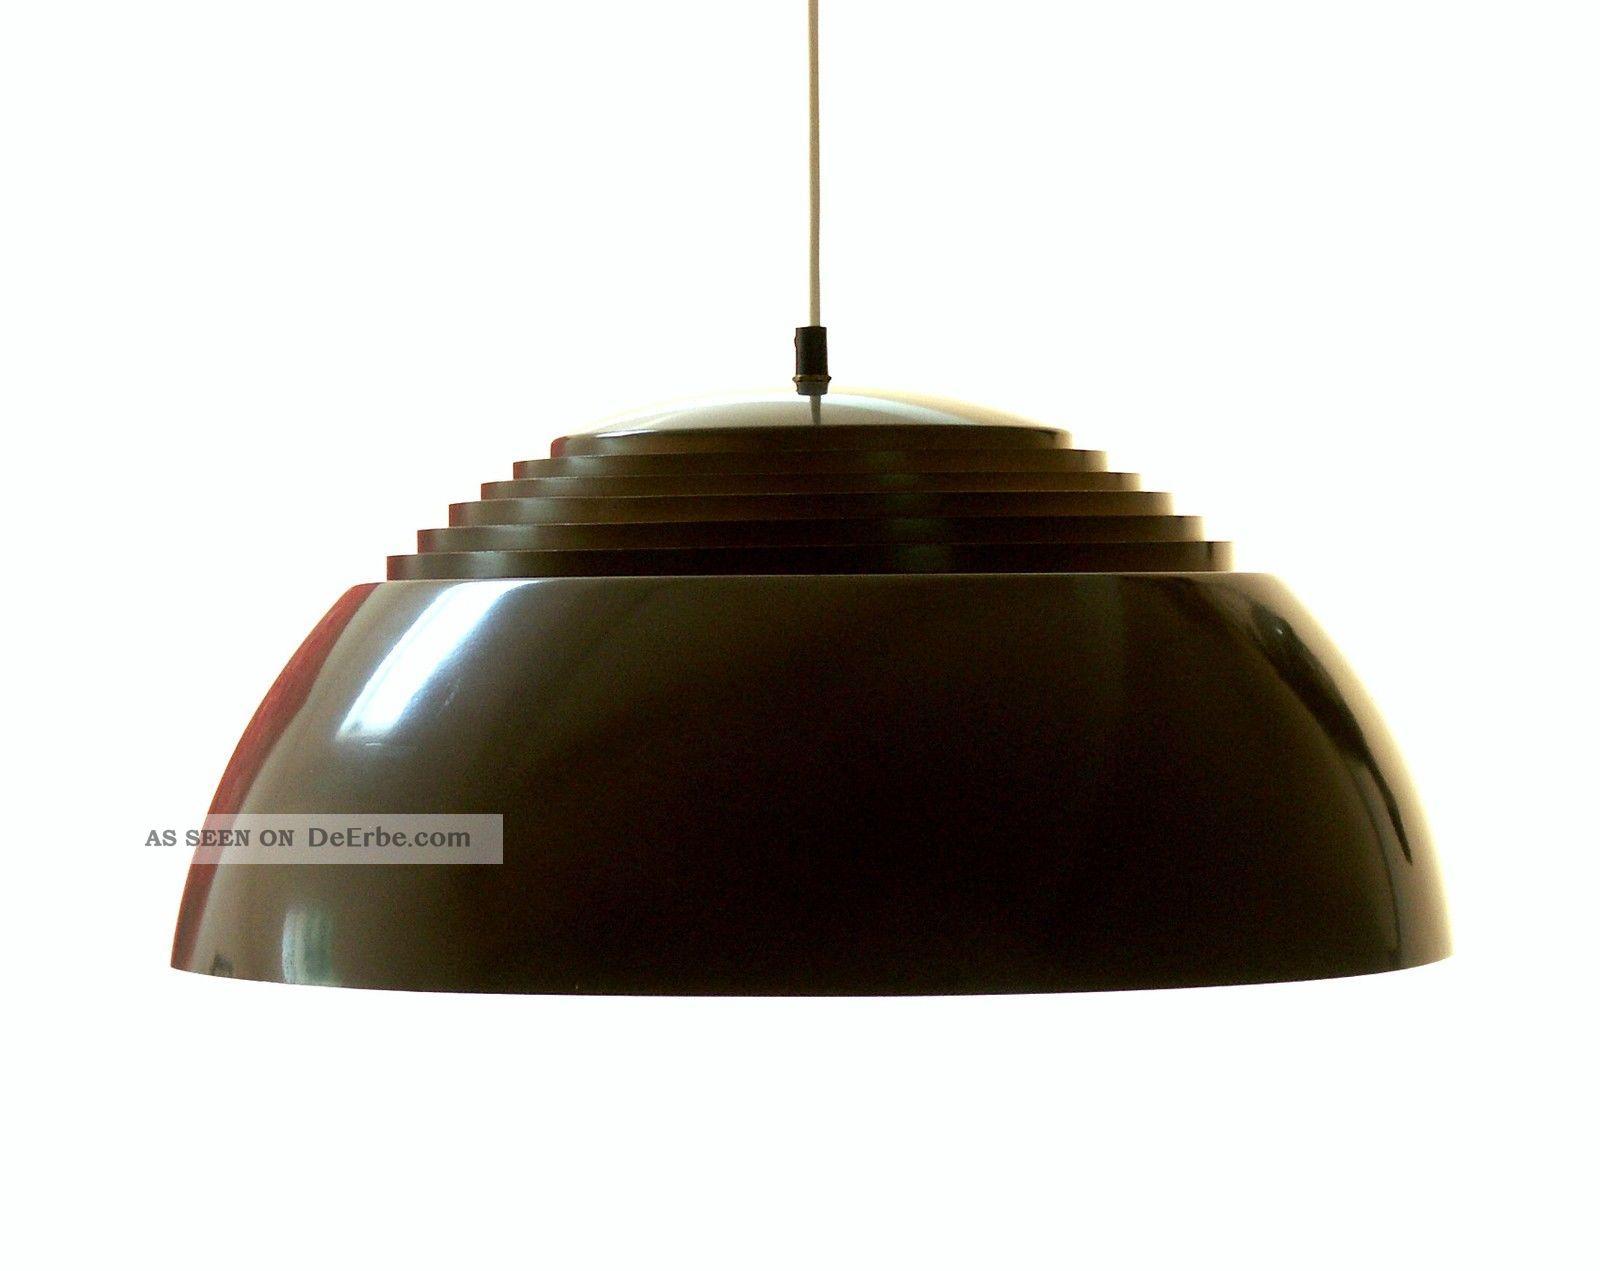 Aj Royal Hängelampe,  Arne Jacobsen / Louis Poulsen,  Ø 50 Cm,  Pendant Lamp 1950-1959 Bild